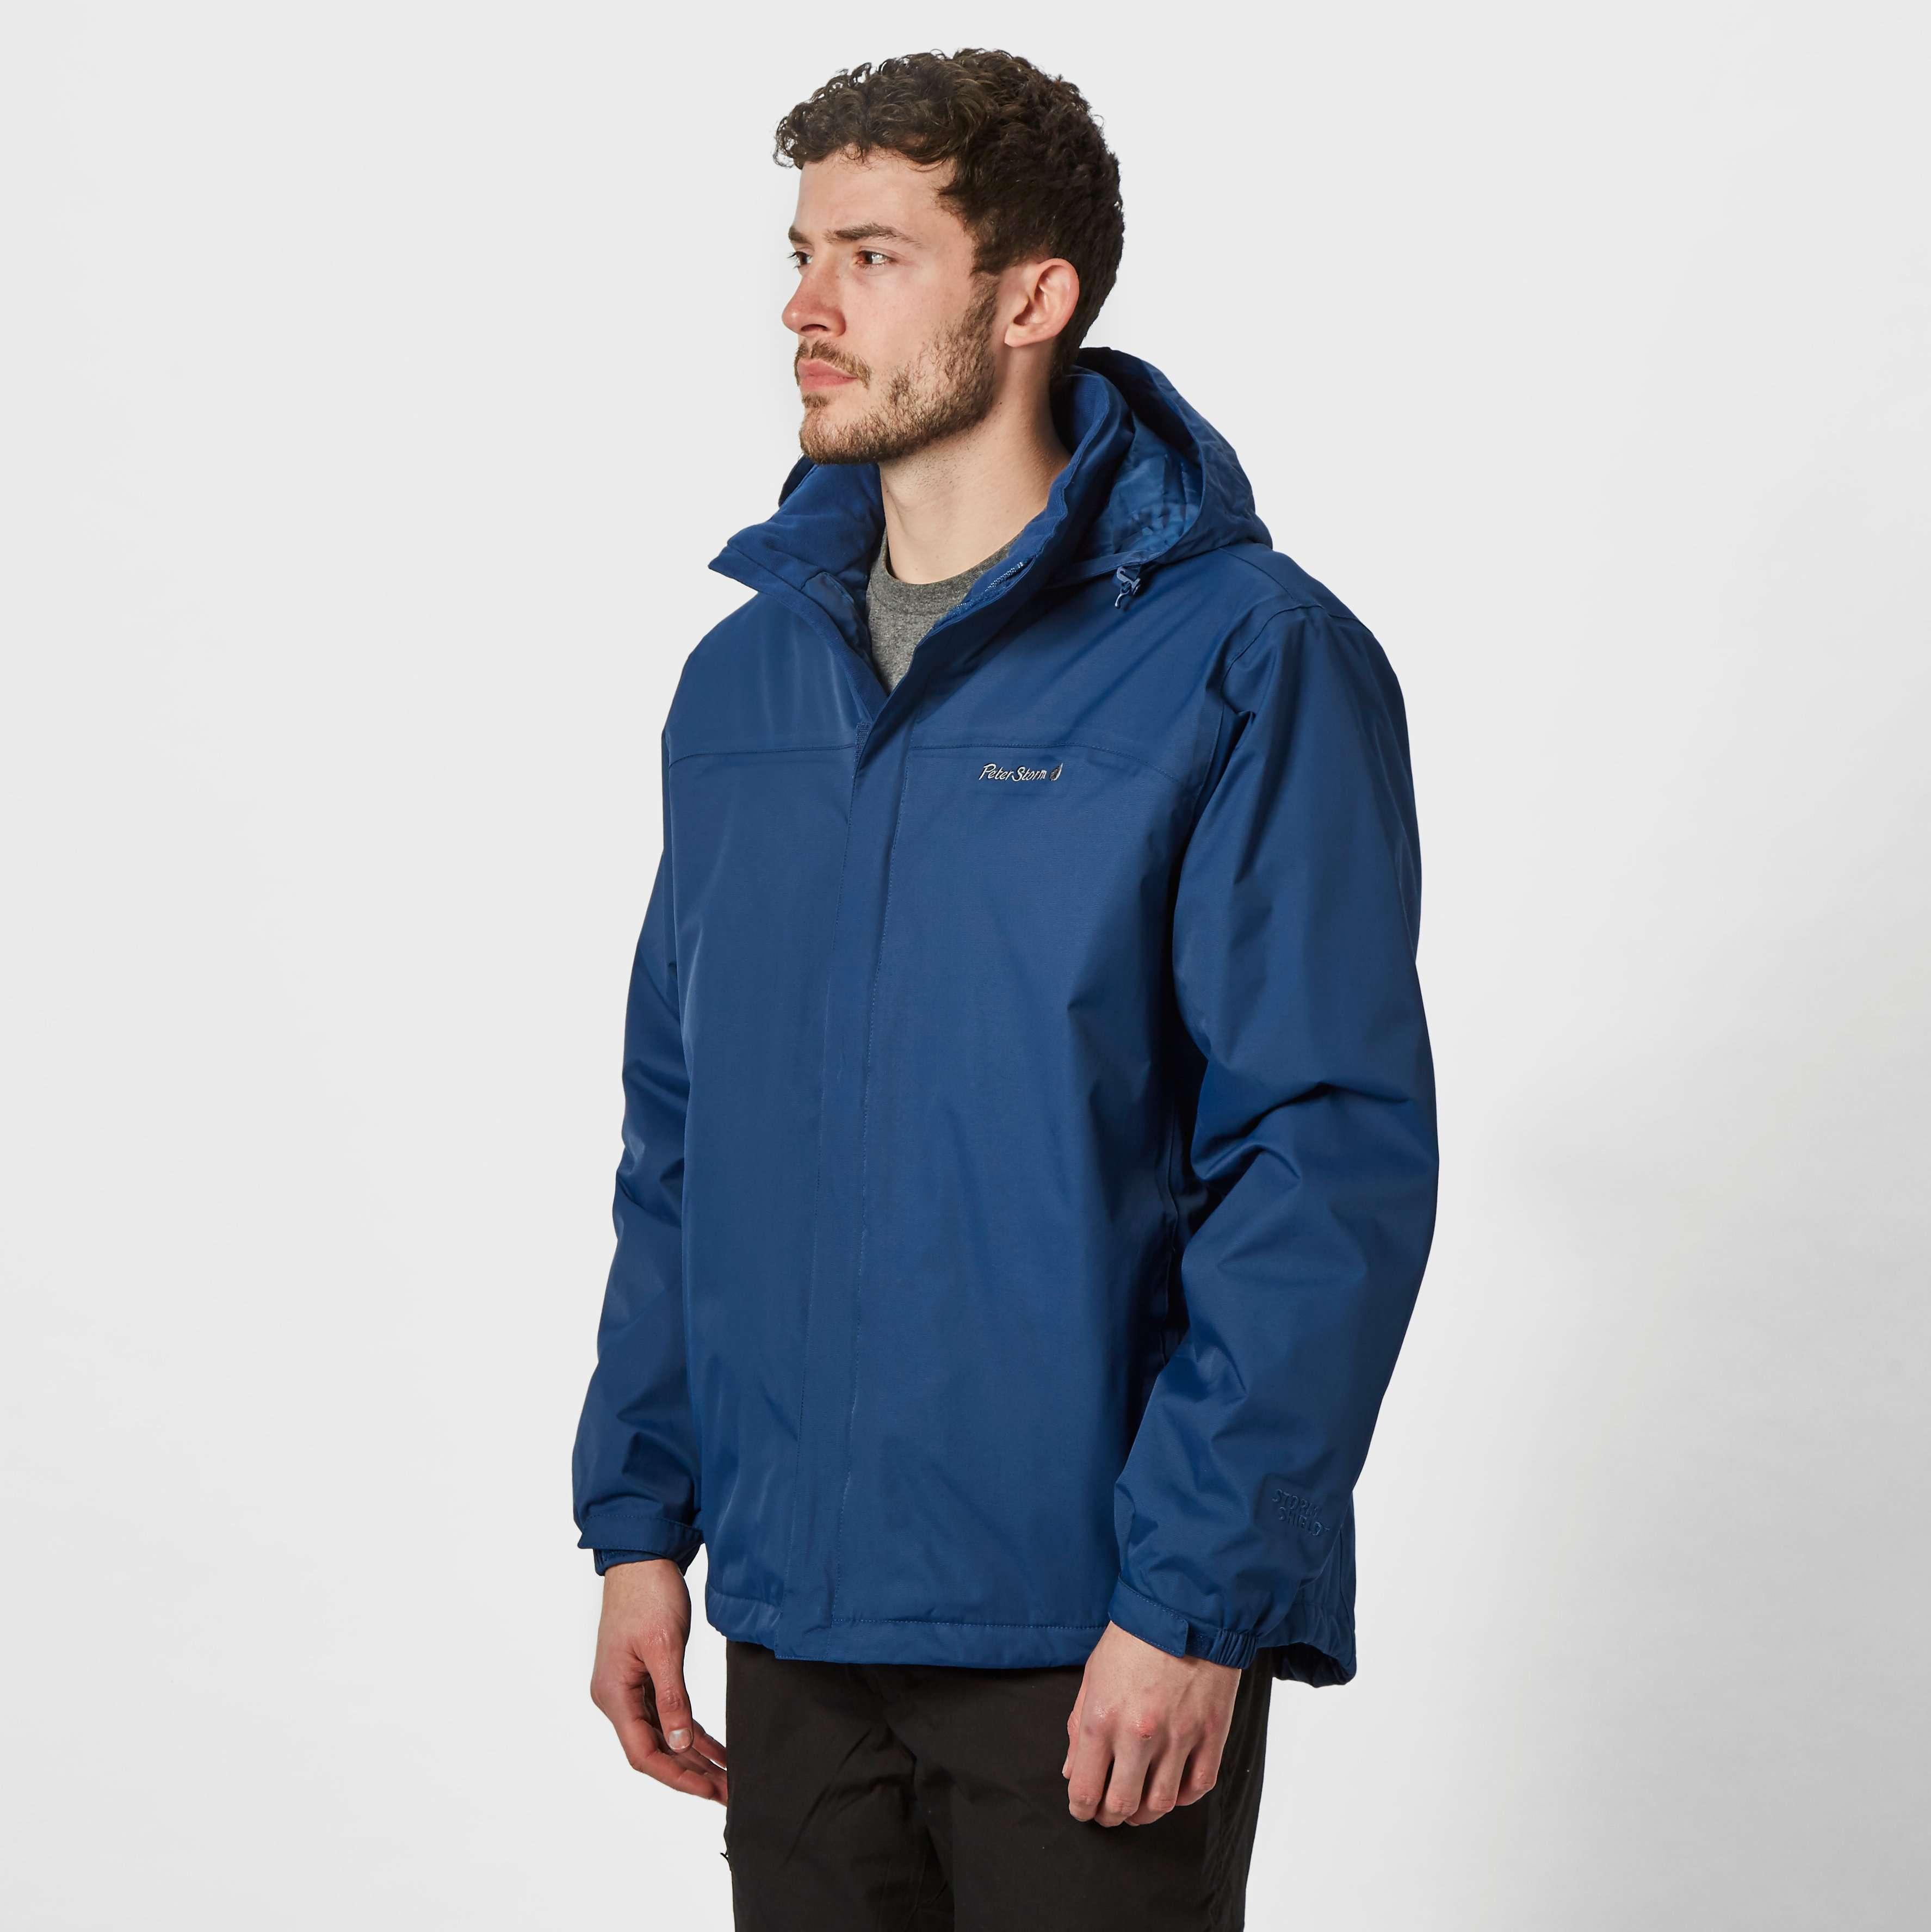 PETER STORM Men's Insulated Storm Jacket